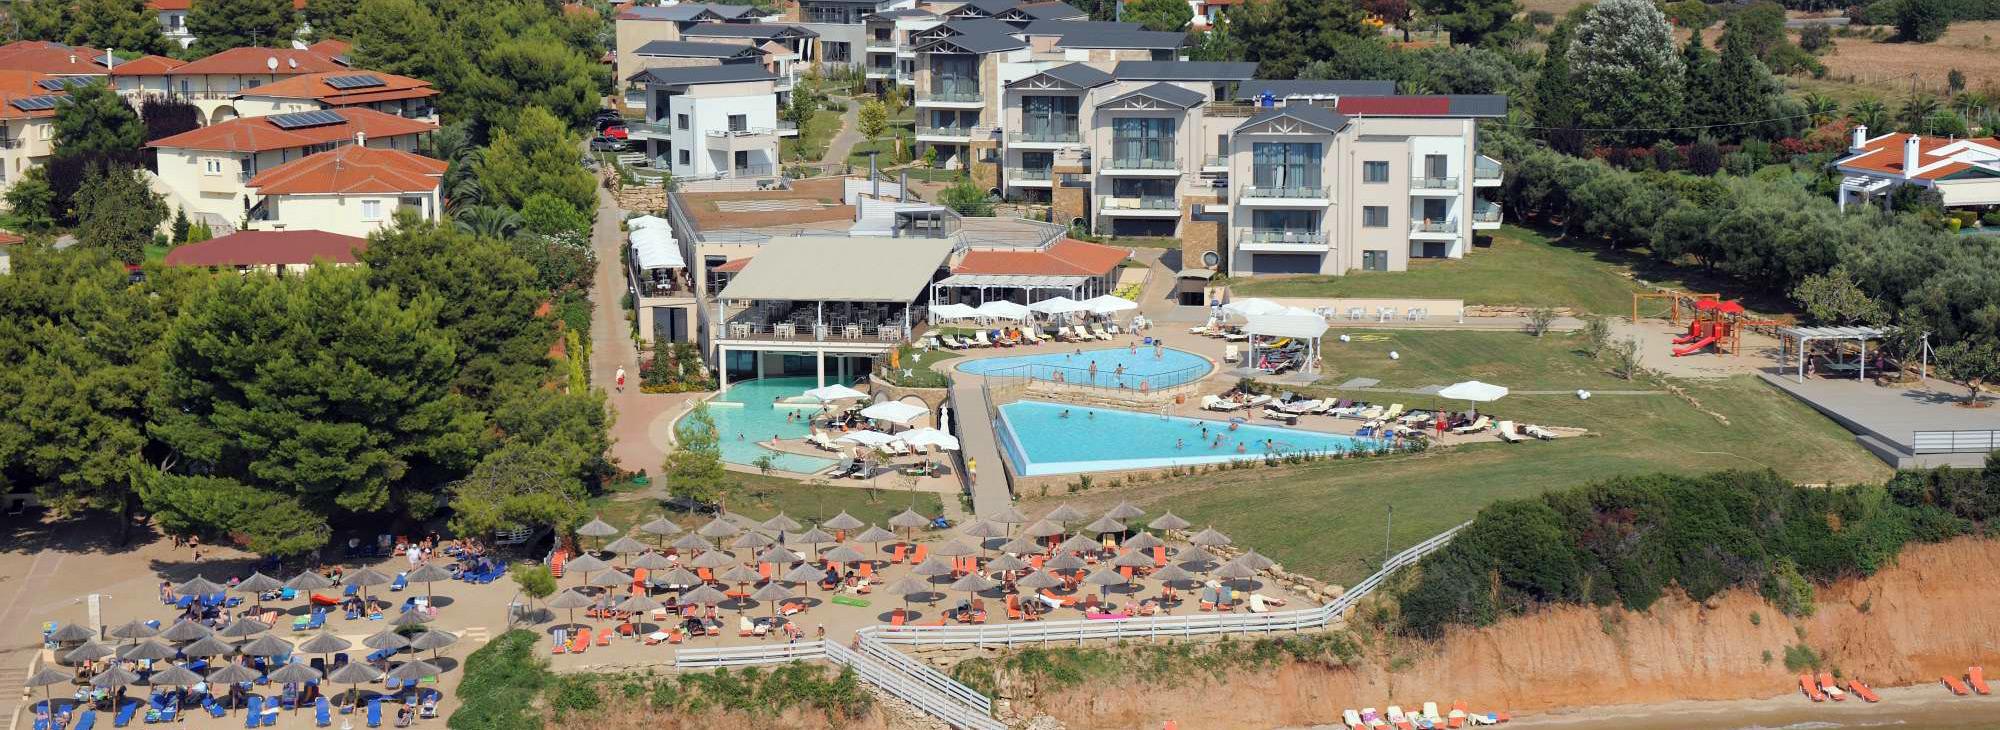 Beach--Pools-9